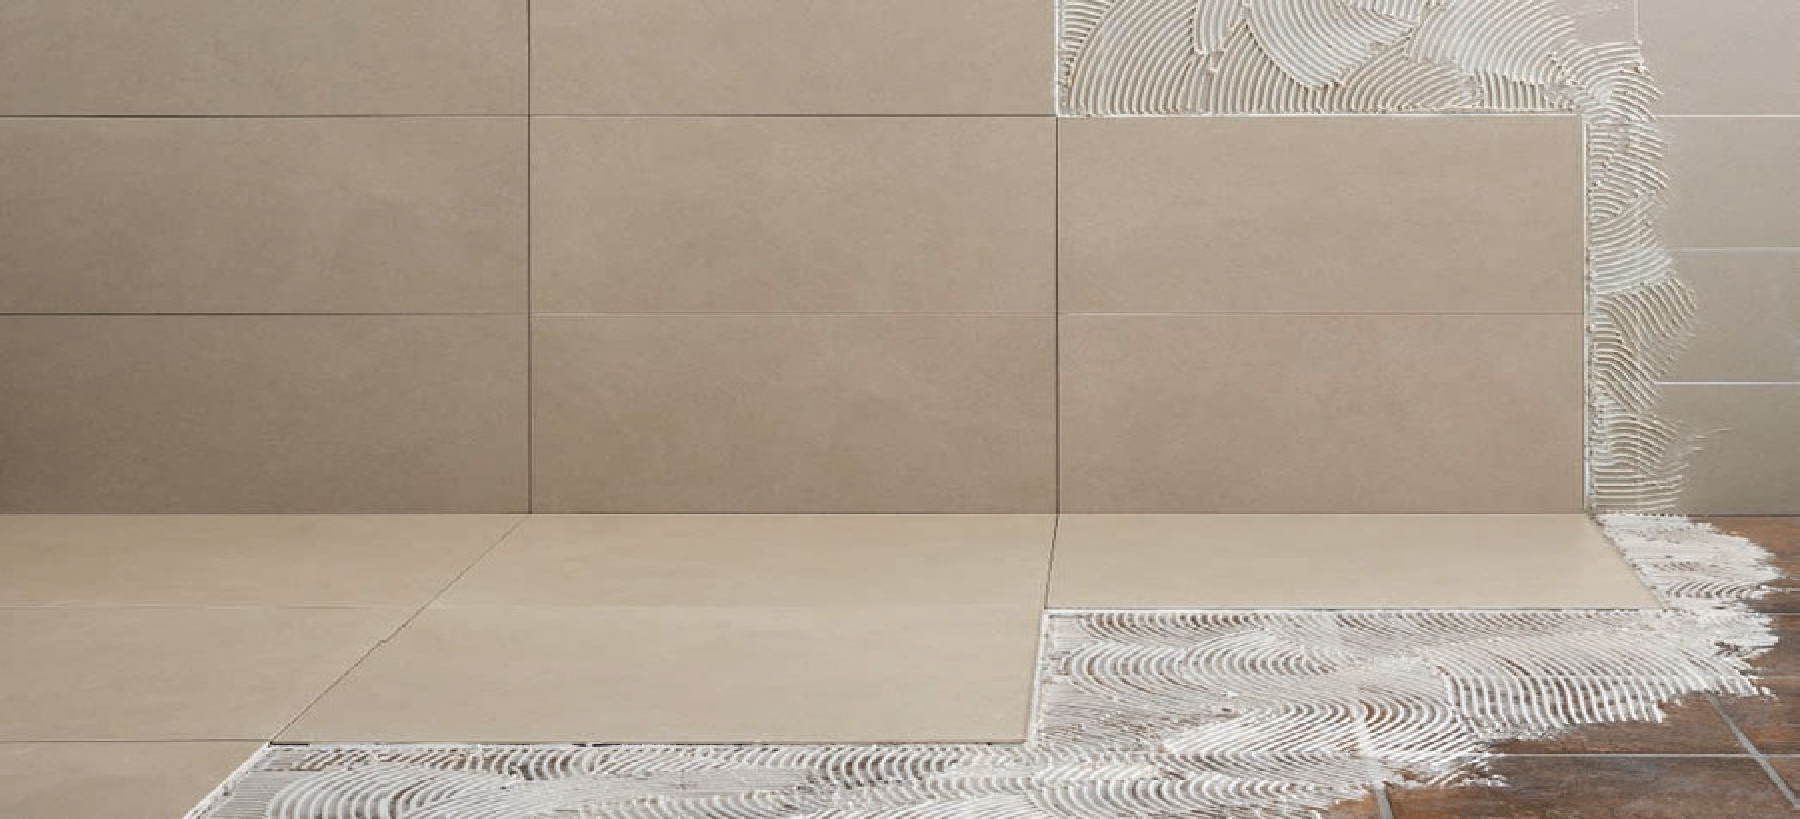 Pavimenti per esterni piastrelle sottili posa su pavimenti - Parquet su piastrelle ...